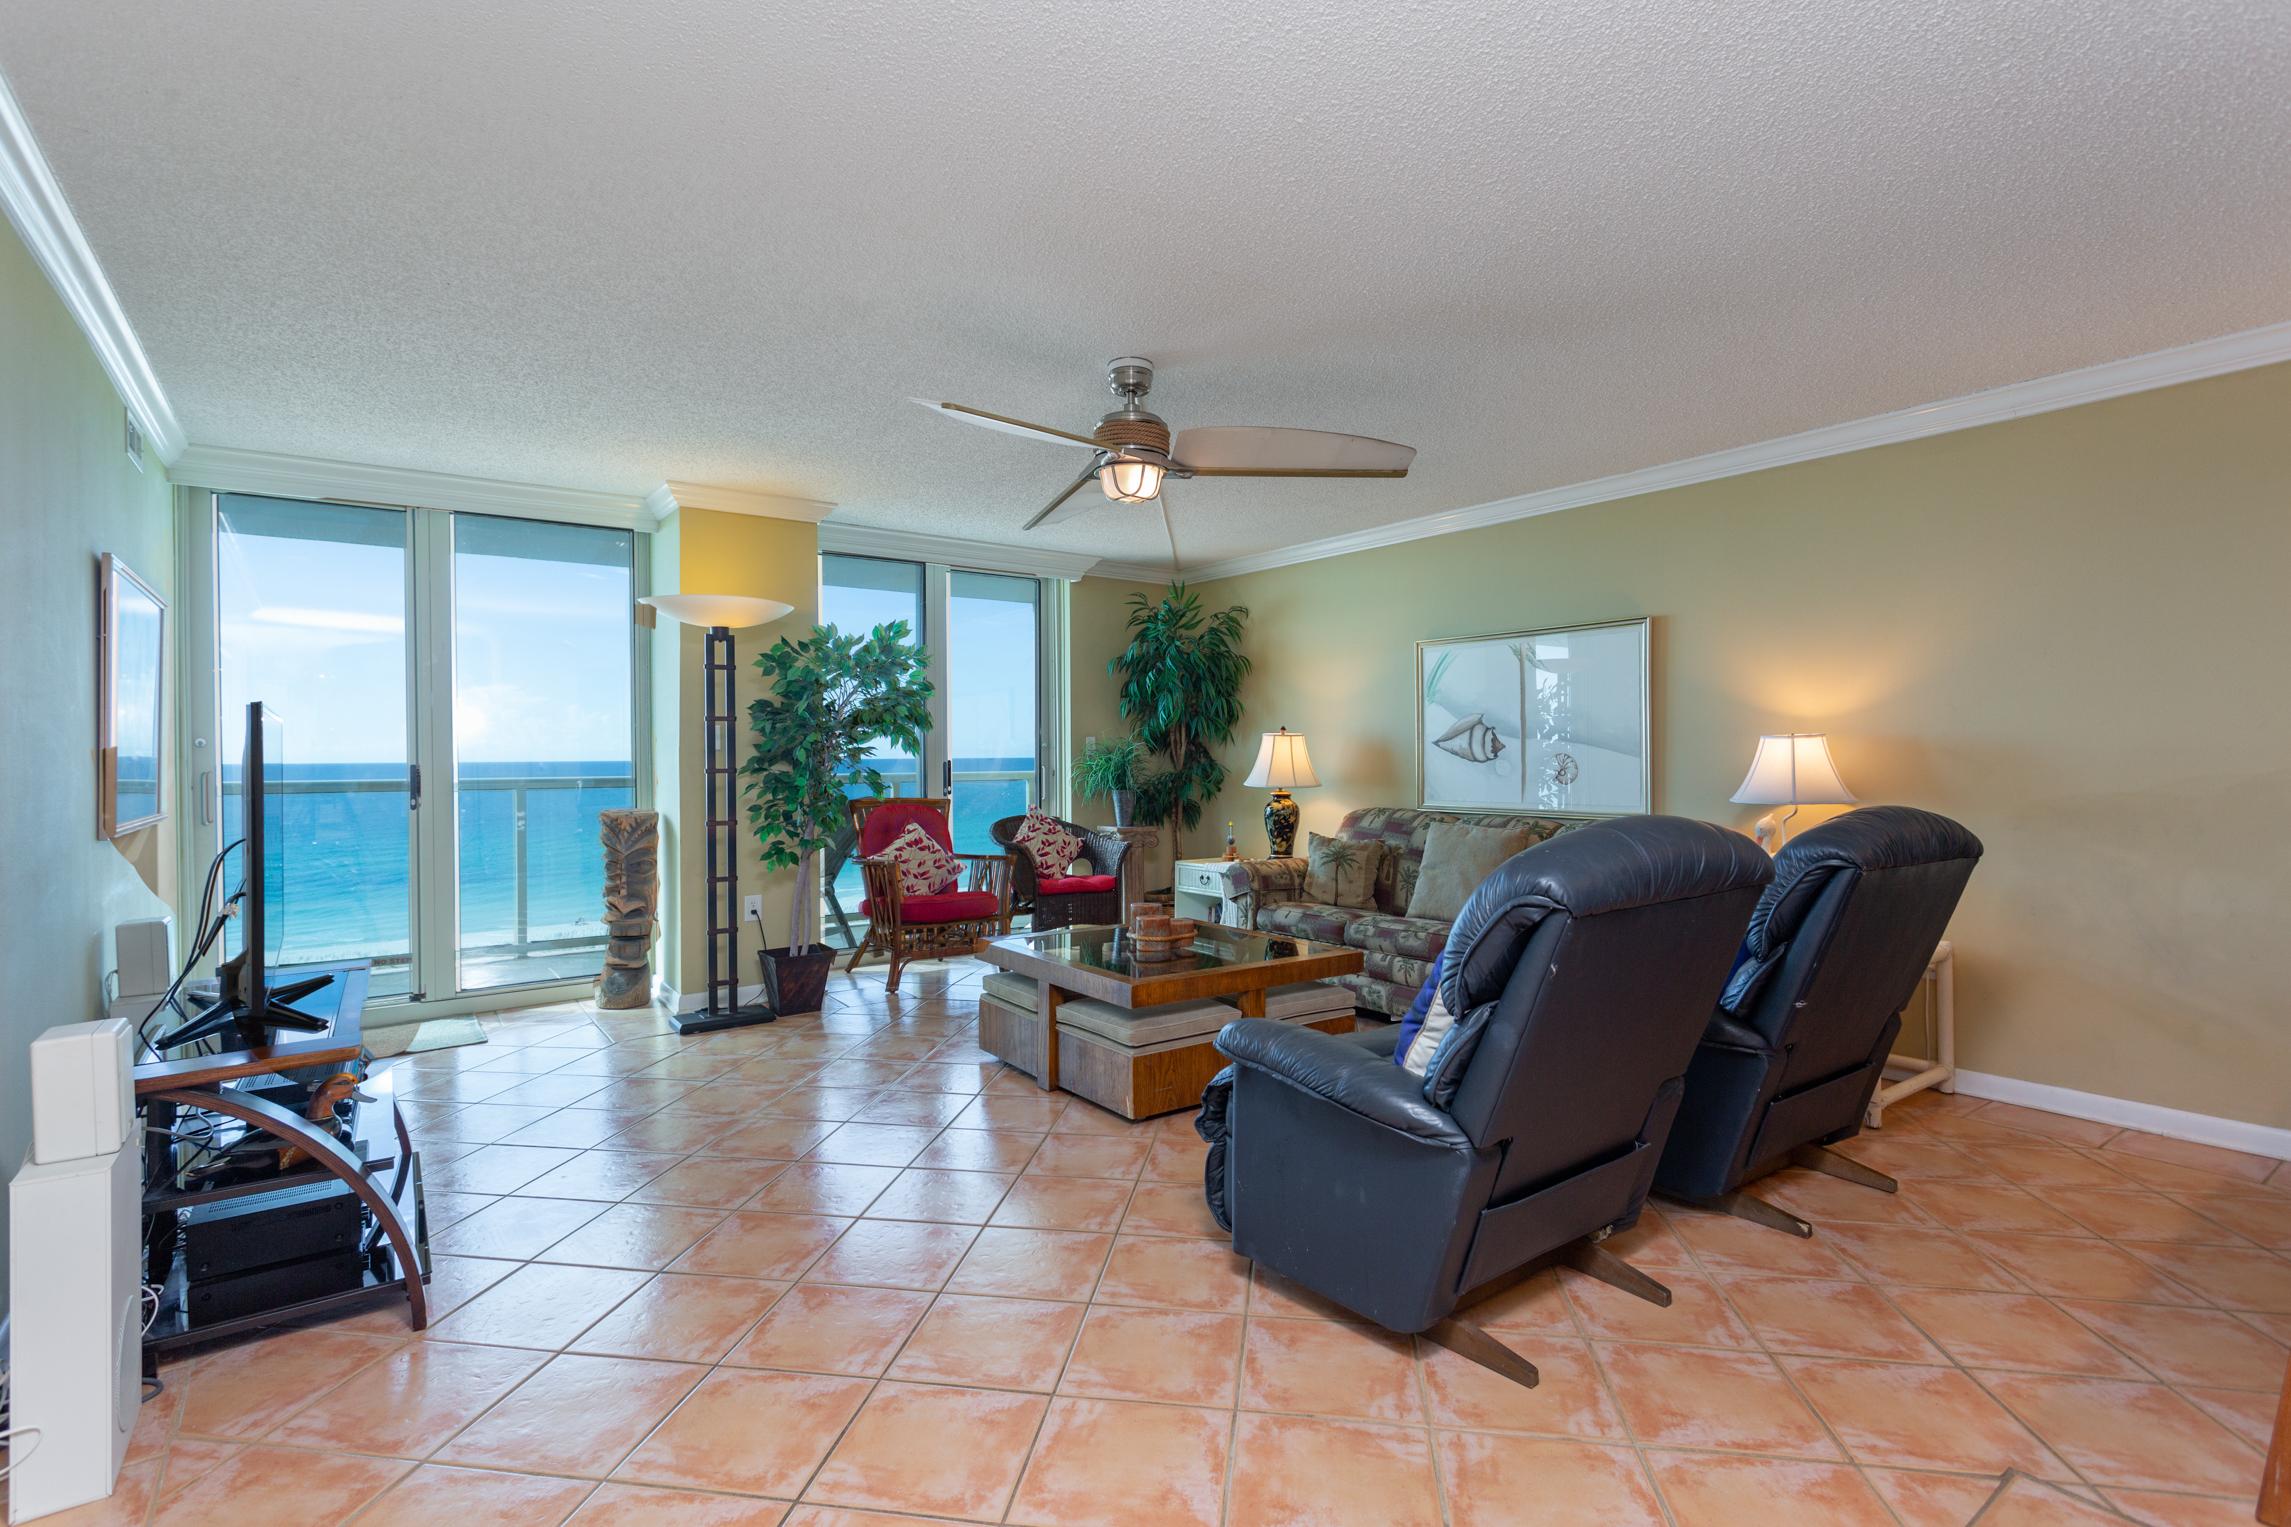 Sabine Yacht & Racquet Club #9D Condo rental in Sabine Yacht & Racquet Club ~ Pensacola Beach Condo Rentals by BeachGuide in Pensacola Beach Florida - #2